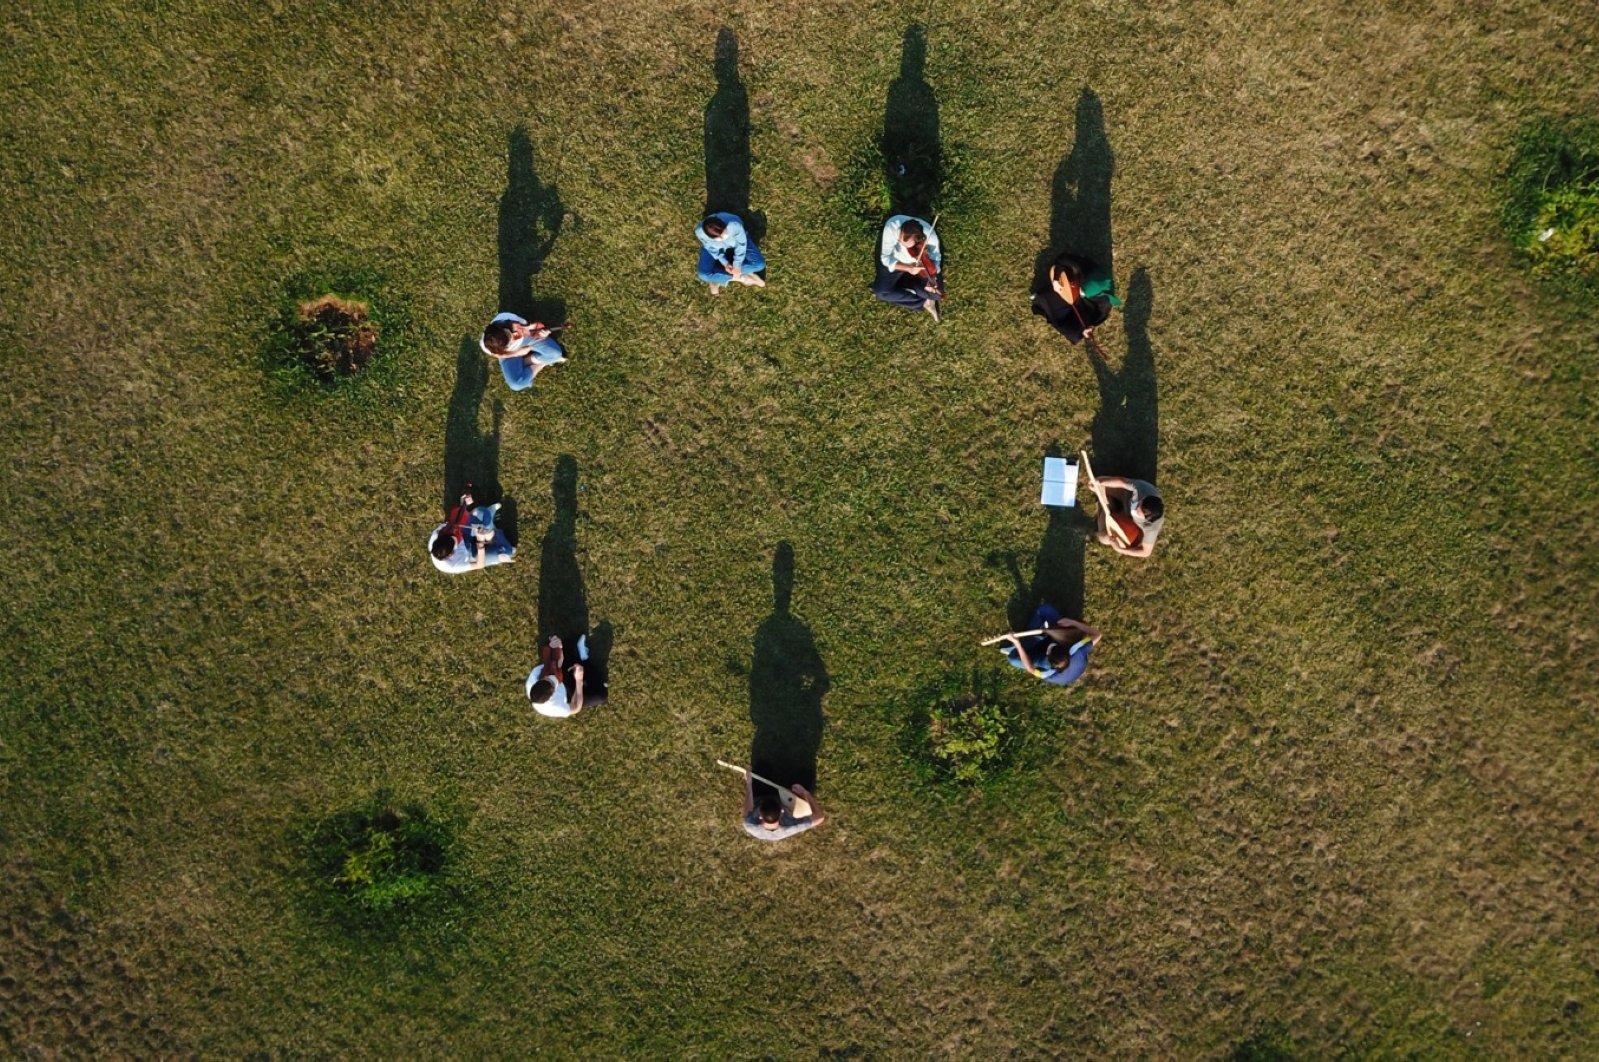 Başakşehir Music Academy students attend a socially distanced outdoor lesson, Başakşehir district, Istanbul, Turkey, July 18, 2020. (DHA Photo)